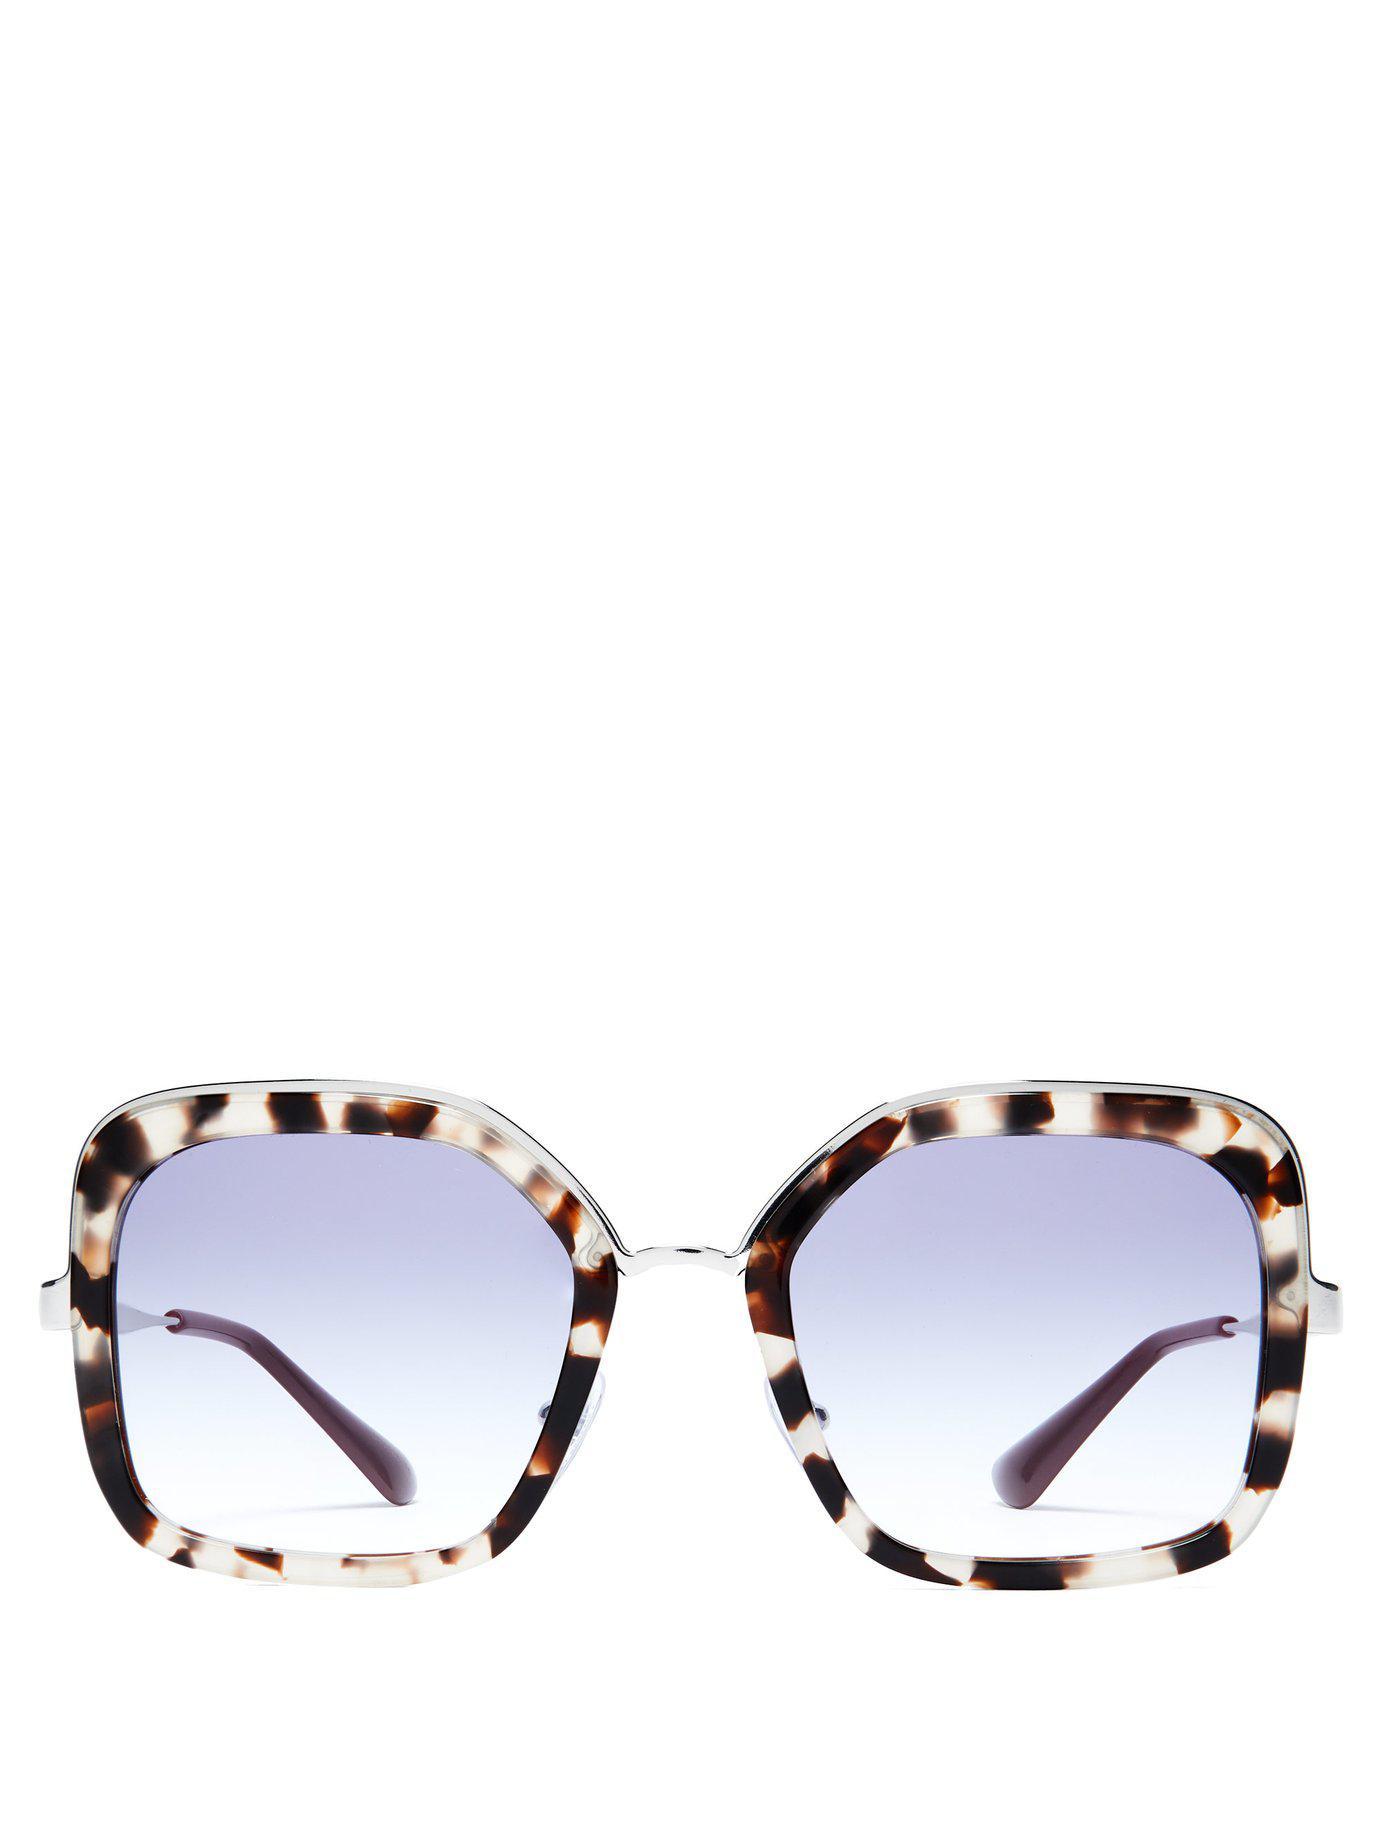 ed5c1abd34 Prada. Women s Square Frame Tortoiseshell Sunglasses